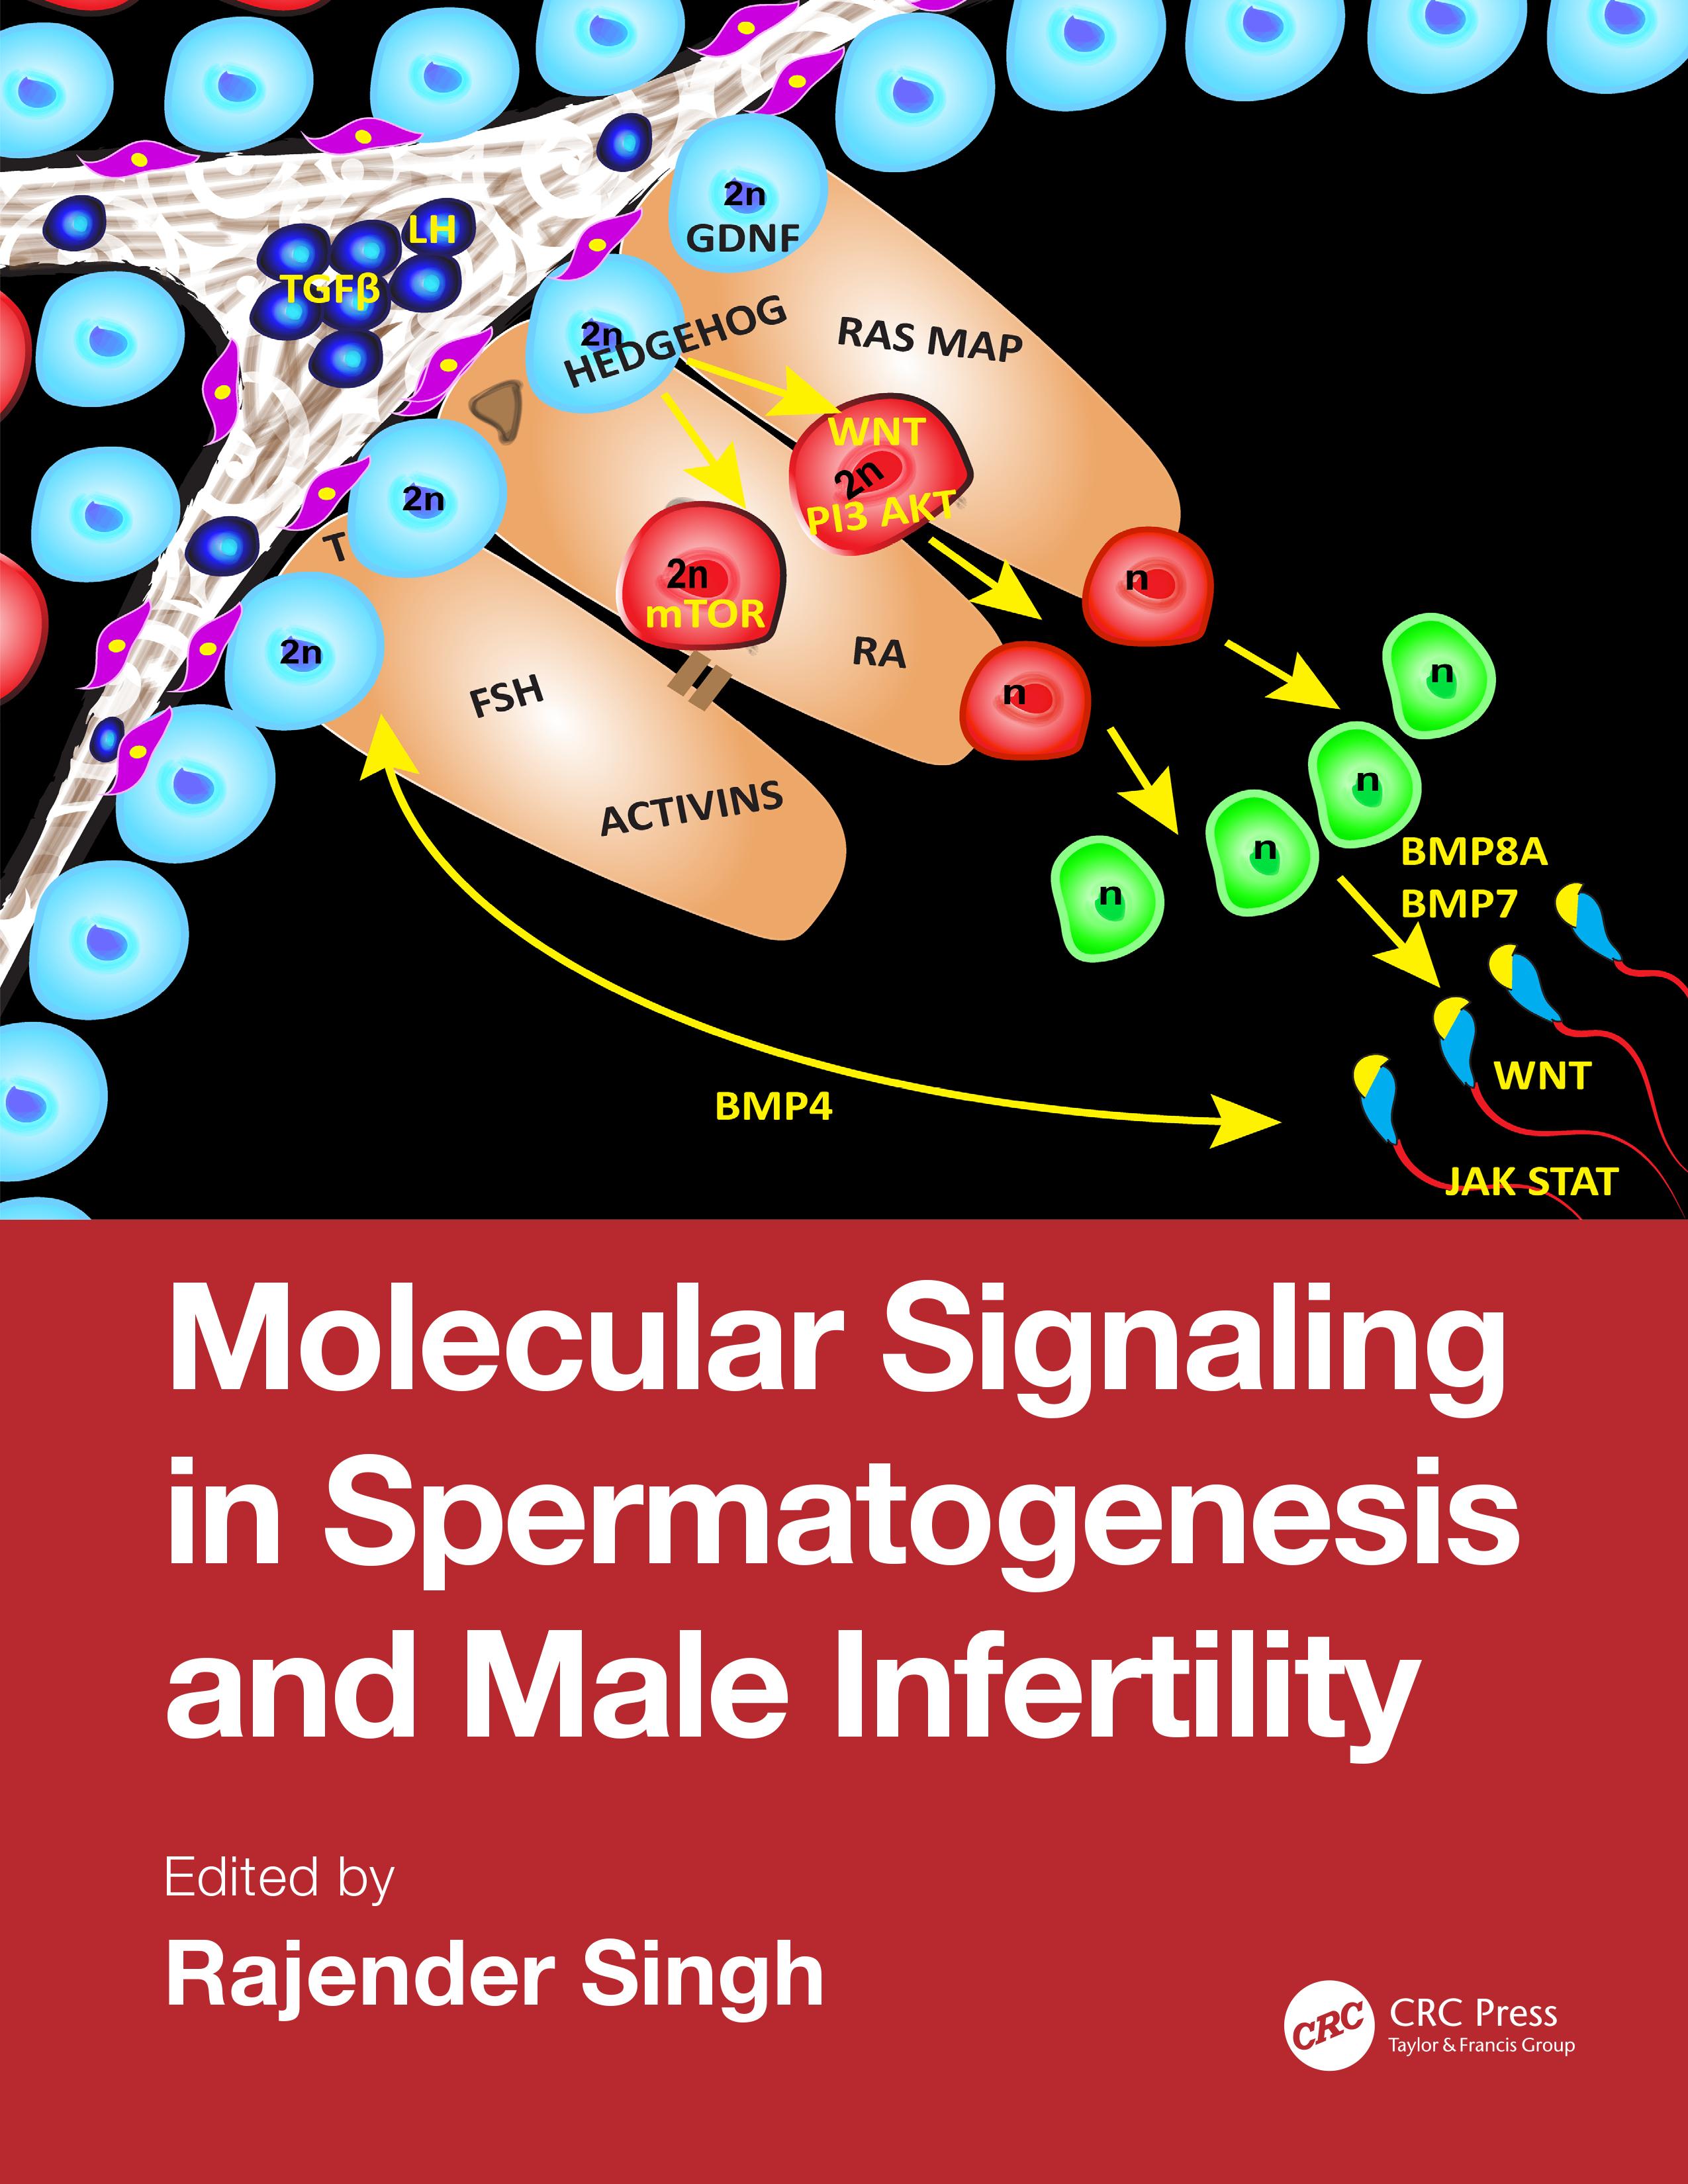 Hormonal regulation of spermatogenesis